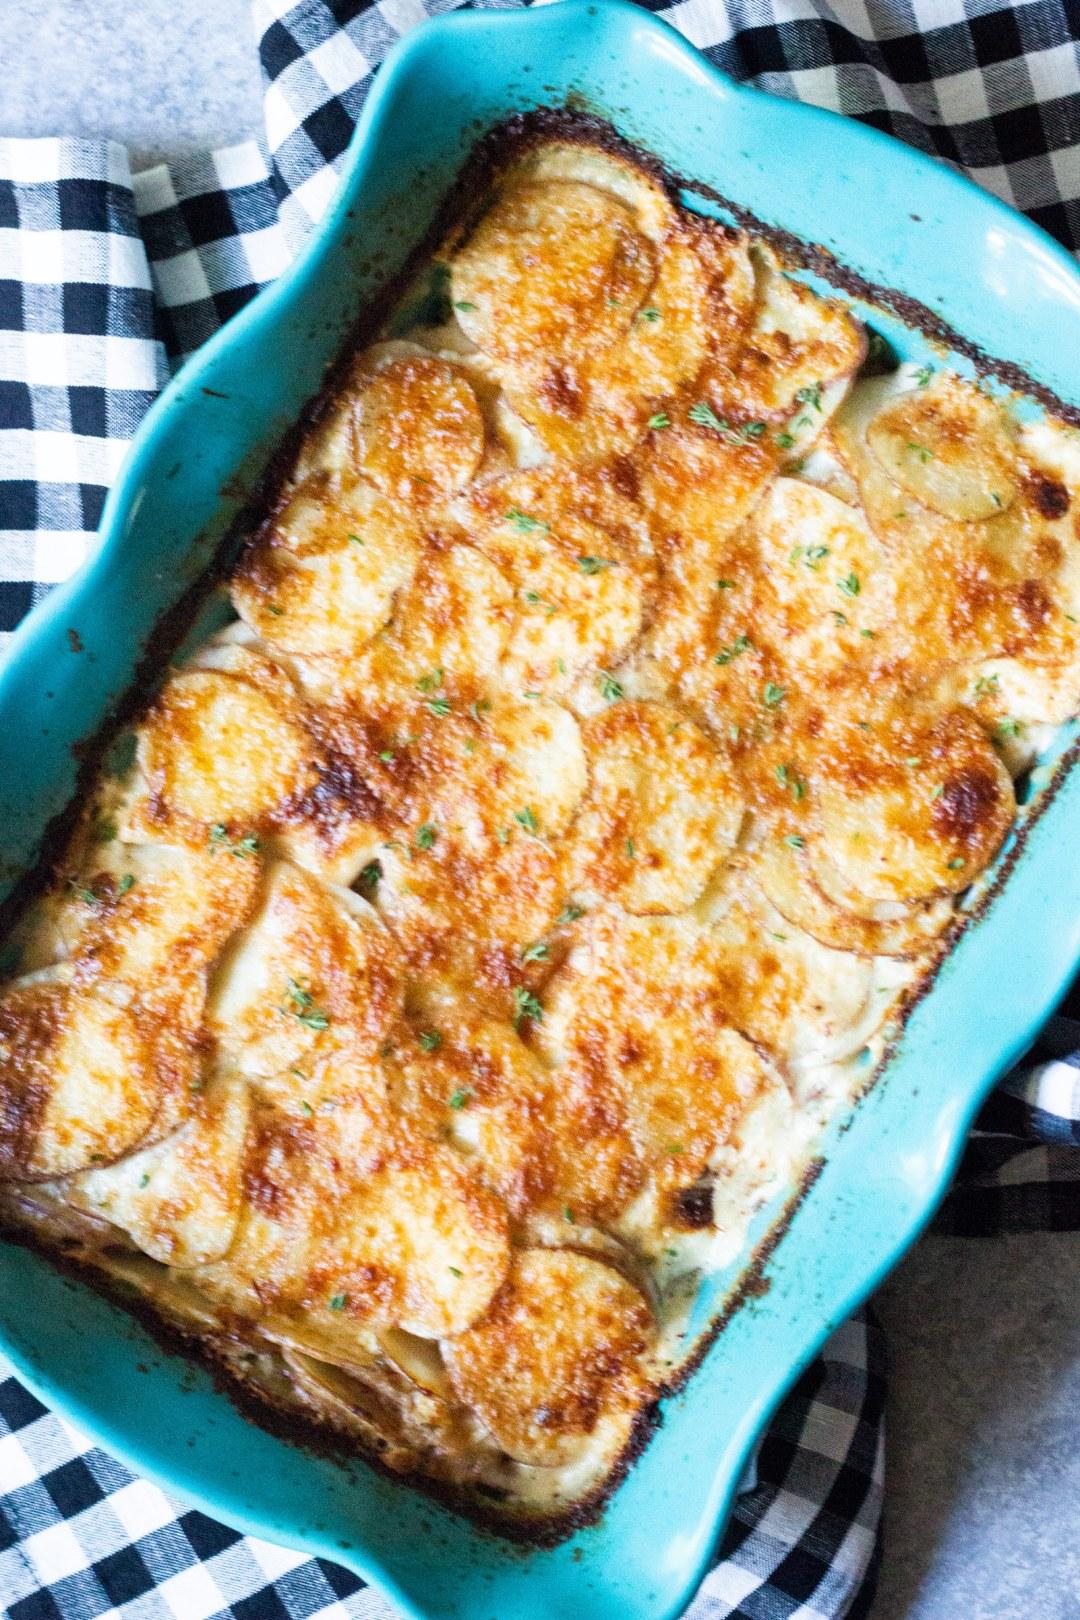 potatoes au gratin, au gratin potatoes, scalloped potatoes, potatoes, side dish, easy side dish, potatoes au gratin recipe, coco and ash